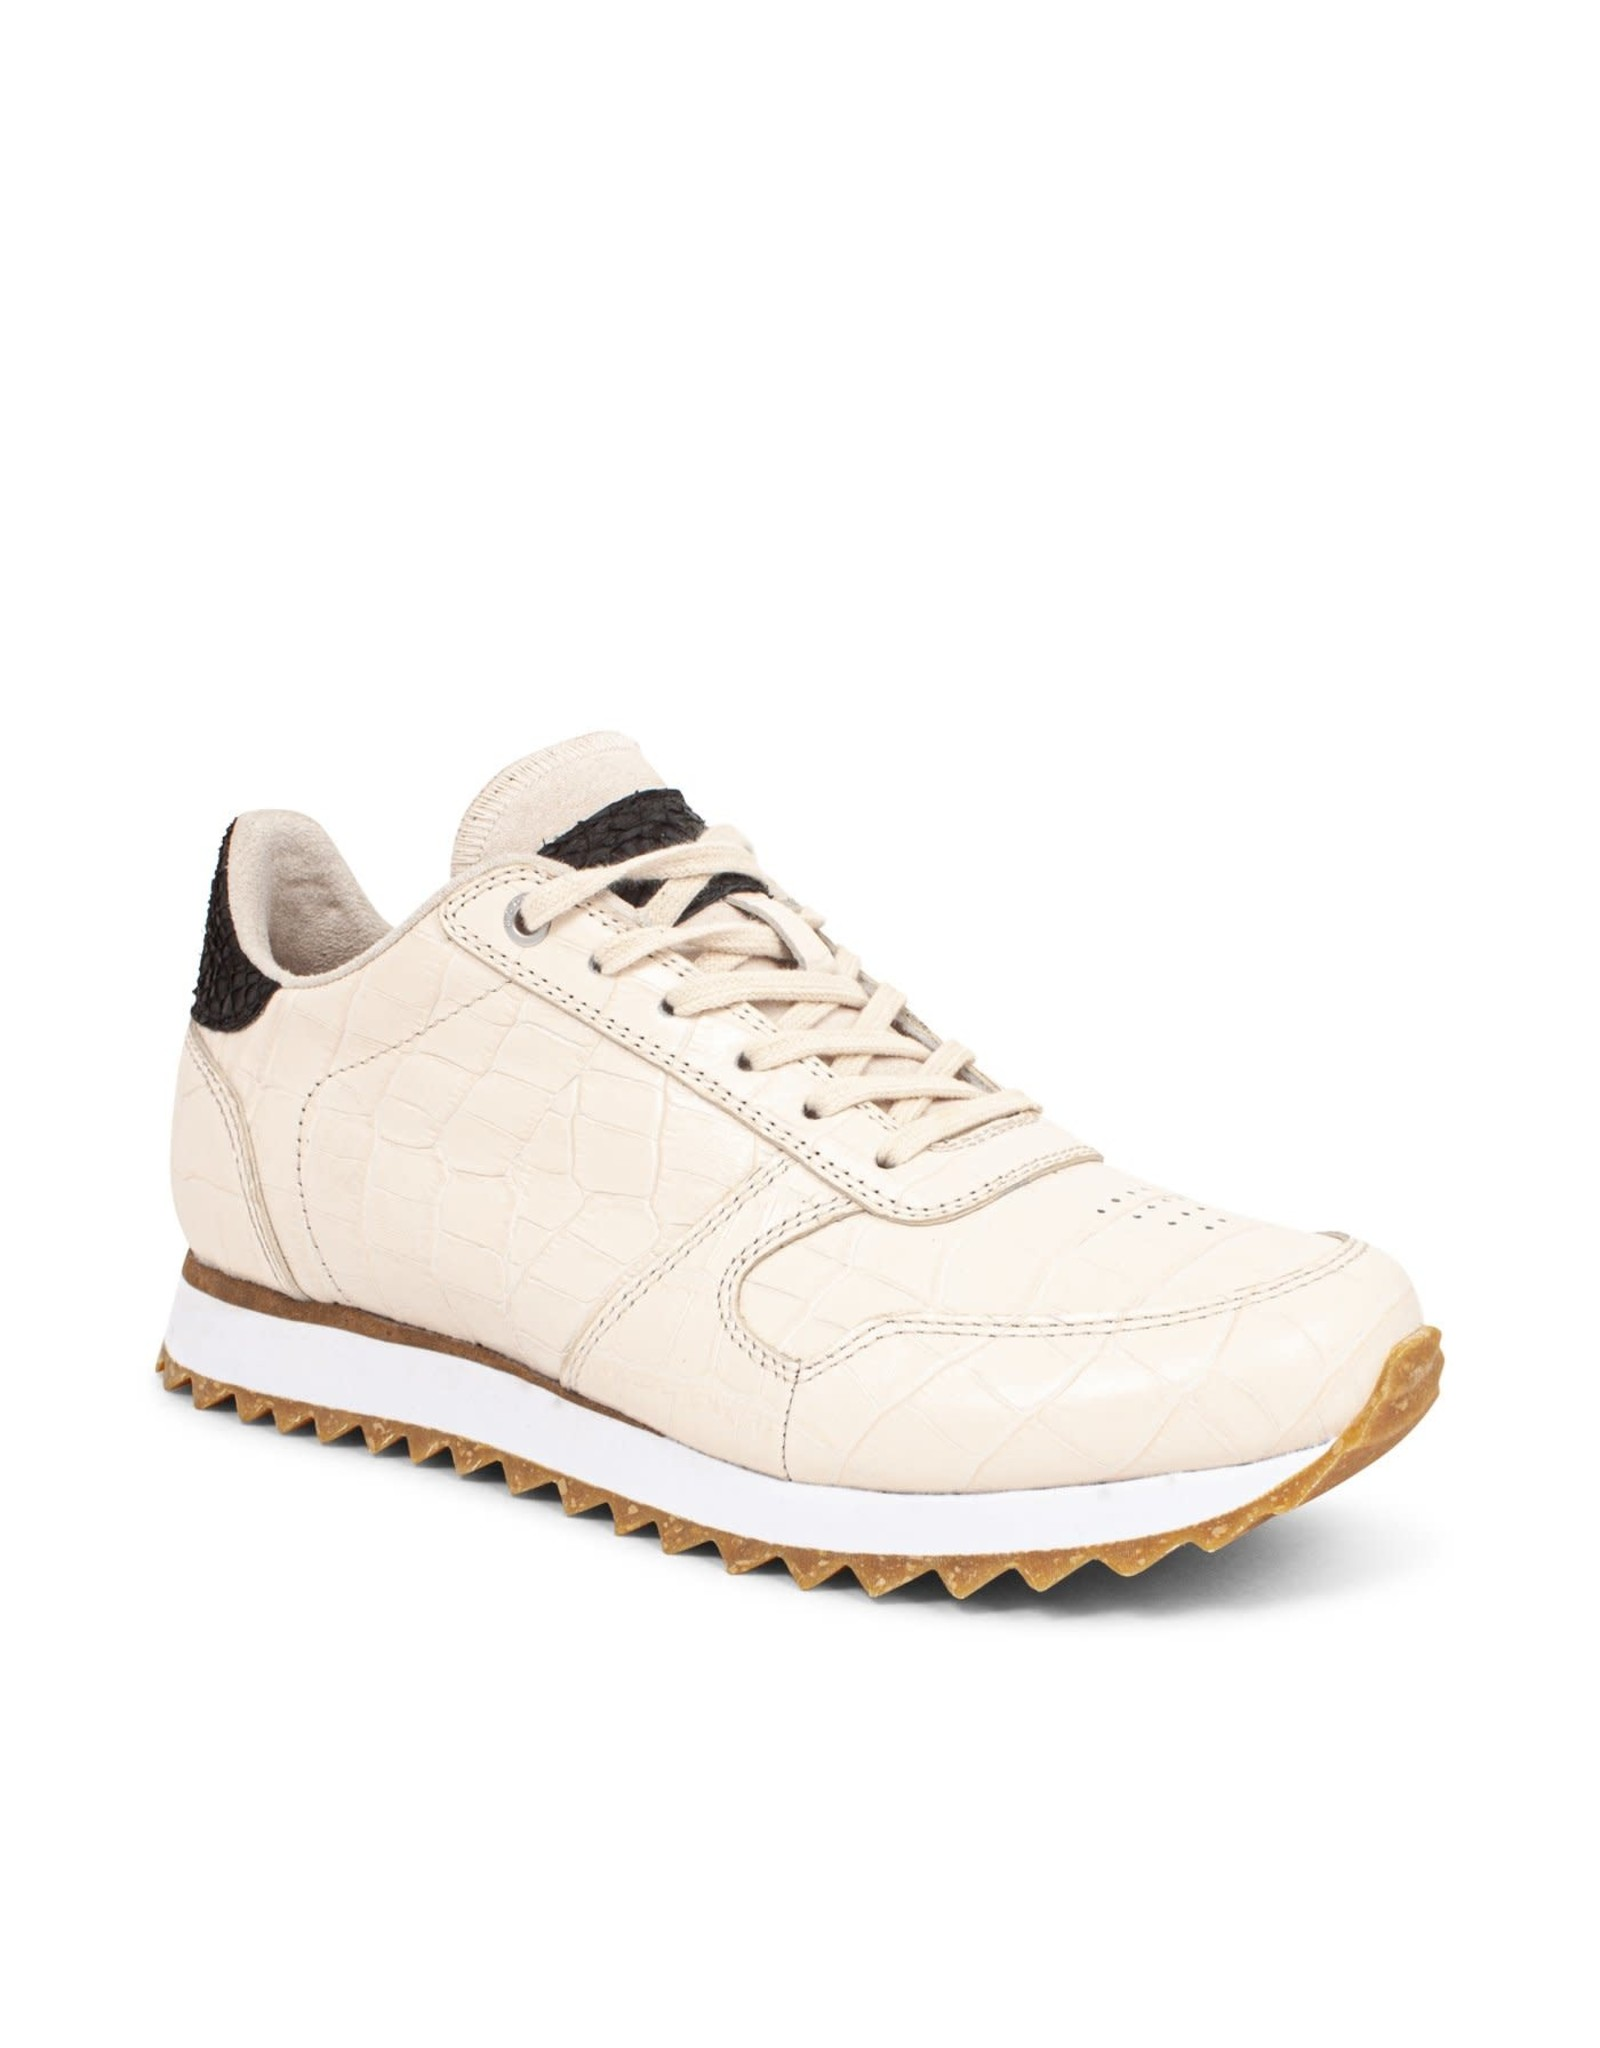 Woden Woden - Ydun Croco Shiny Trainer Leather